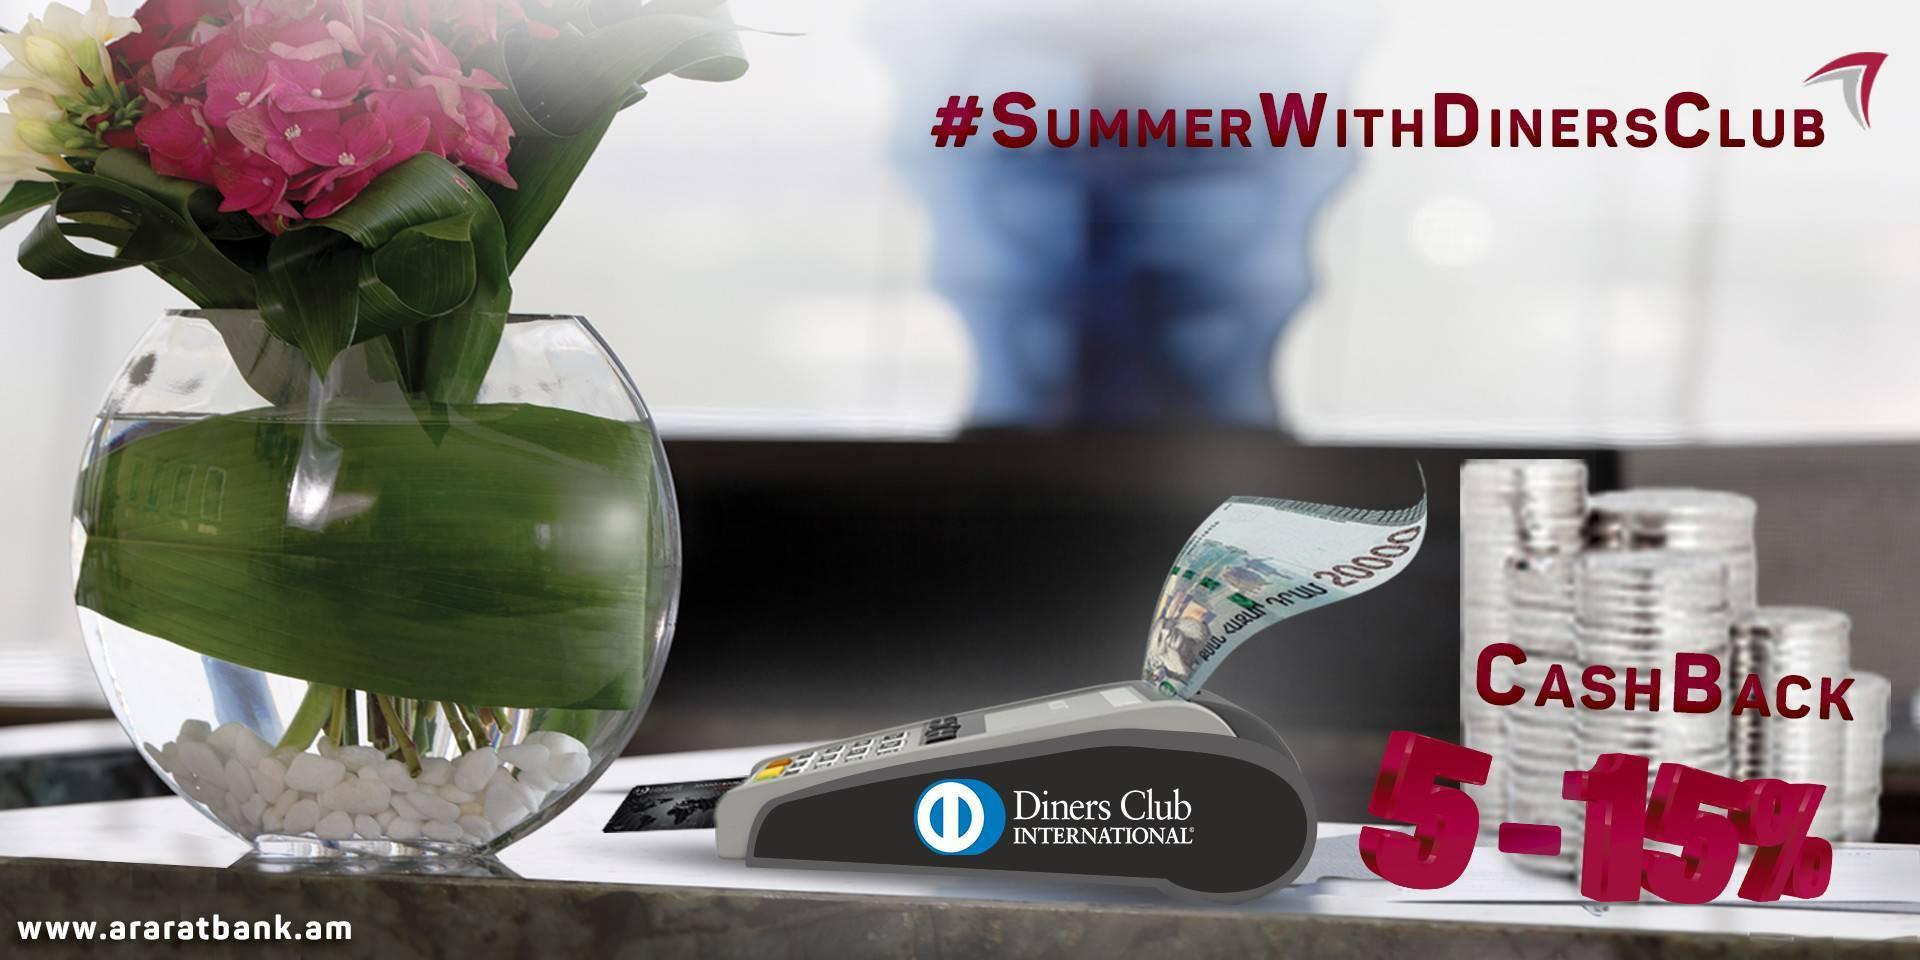 #SummerWithDinersClub